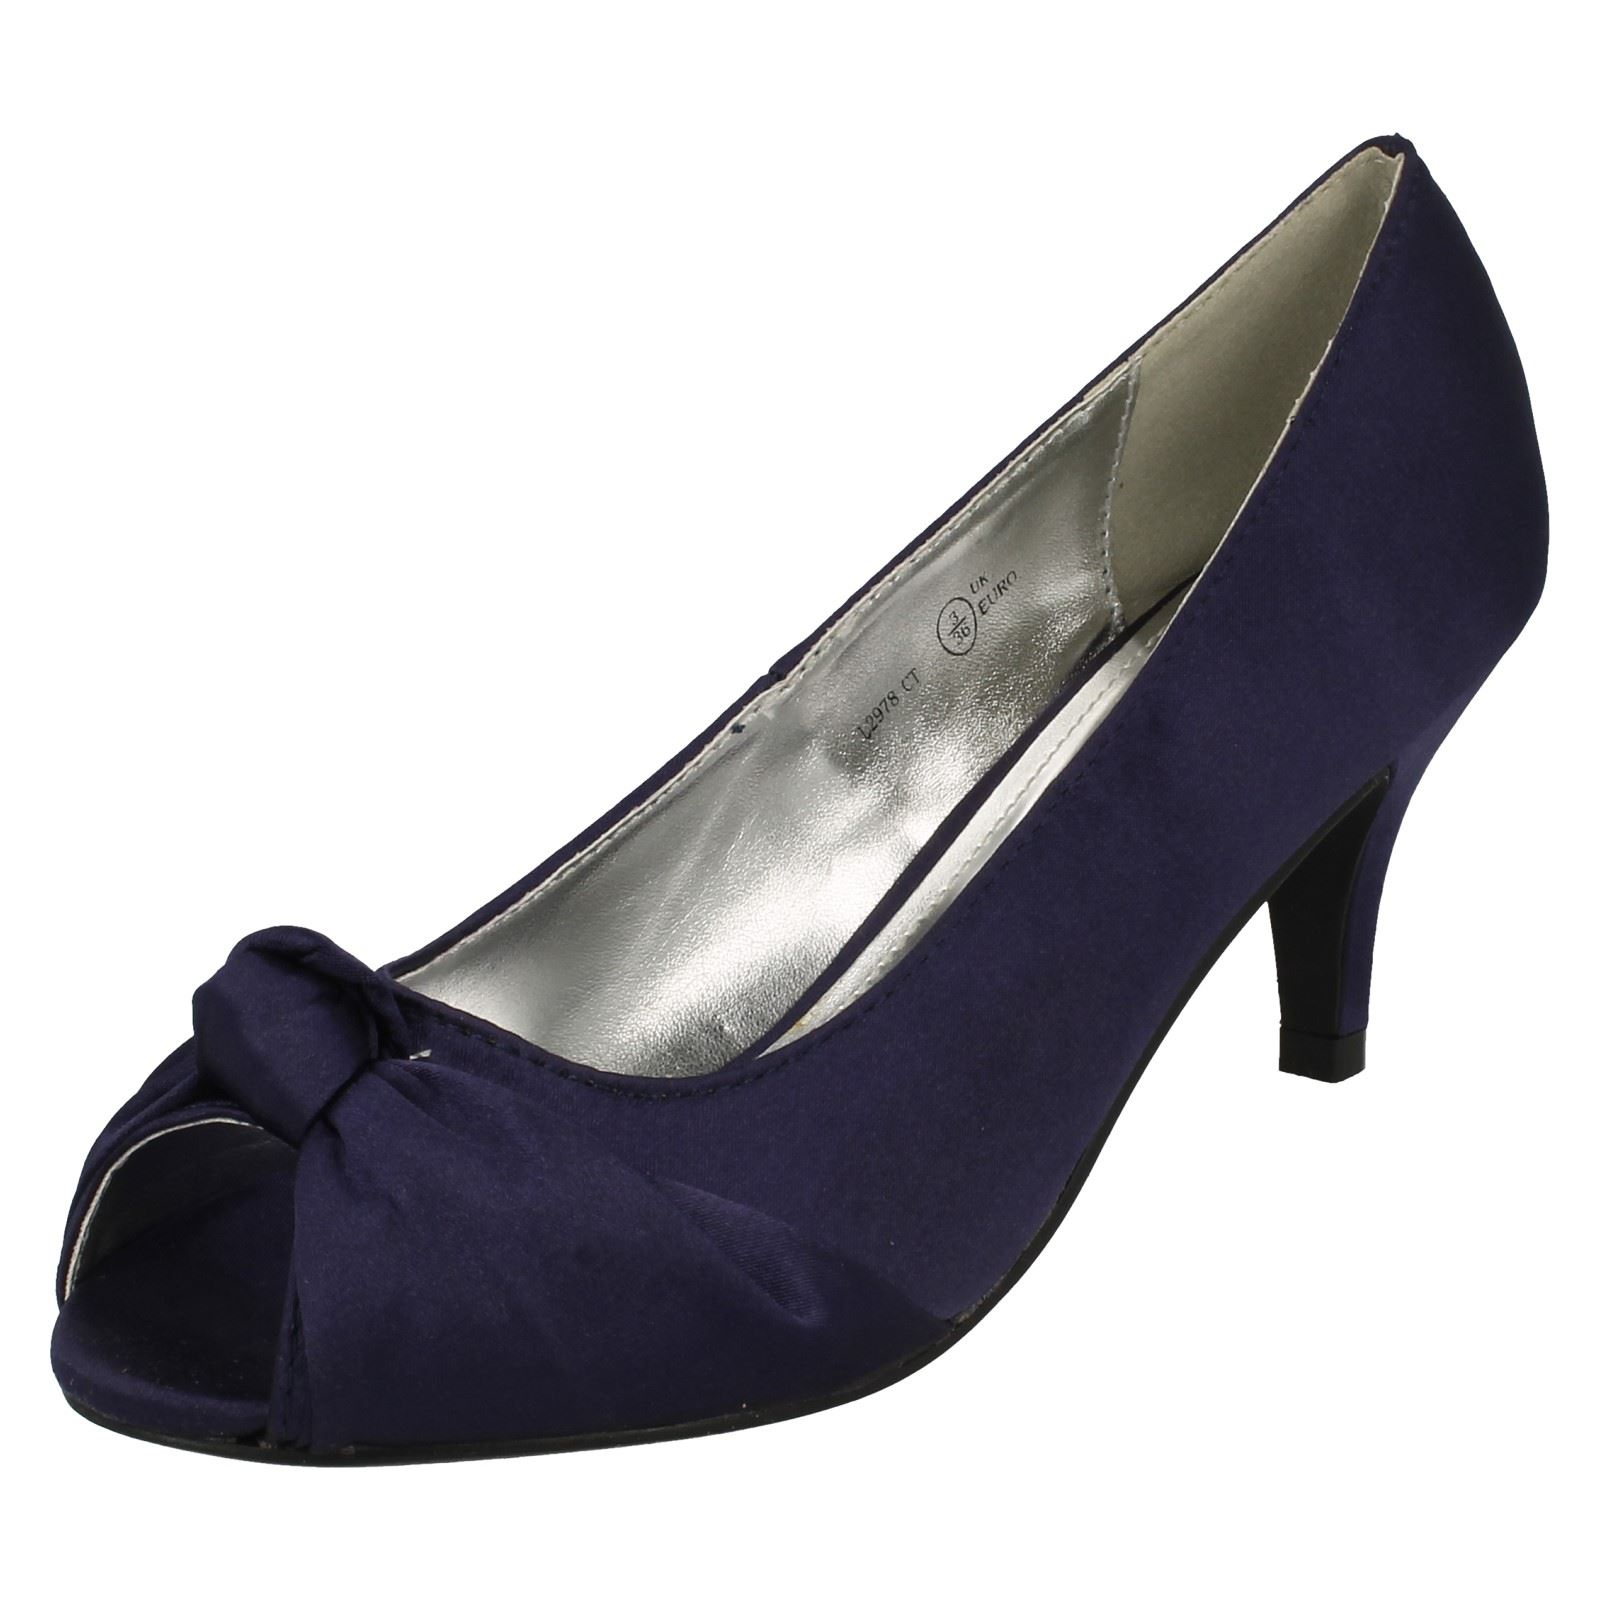 Free shipping and returns on Women's Peep Toe Wedding Shoes at ragabjv.gq